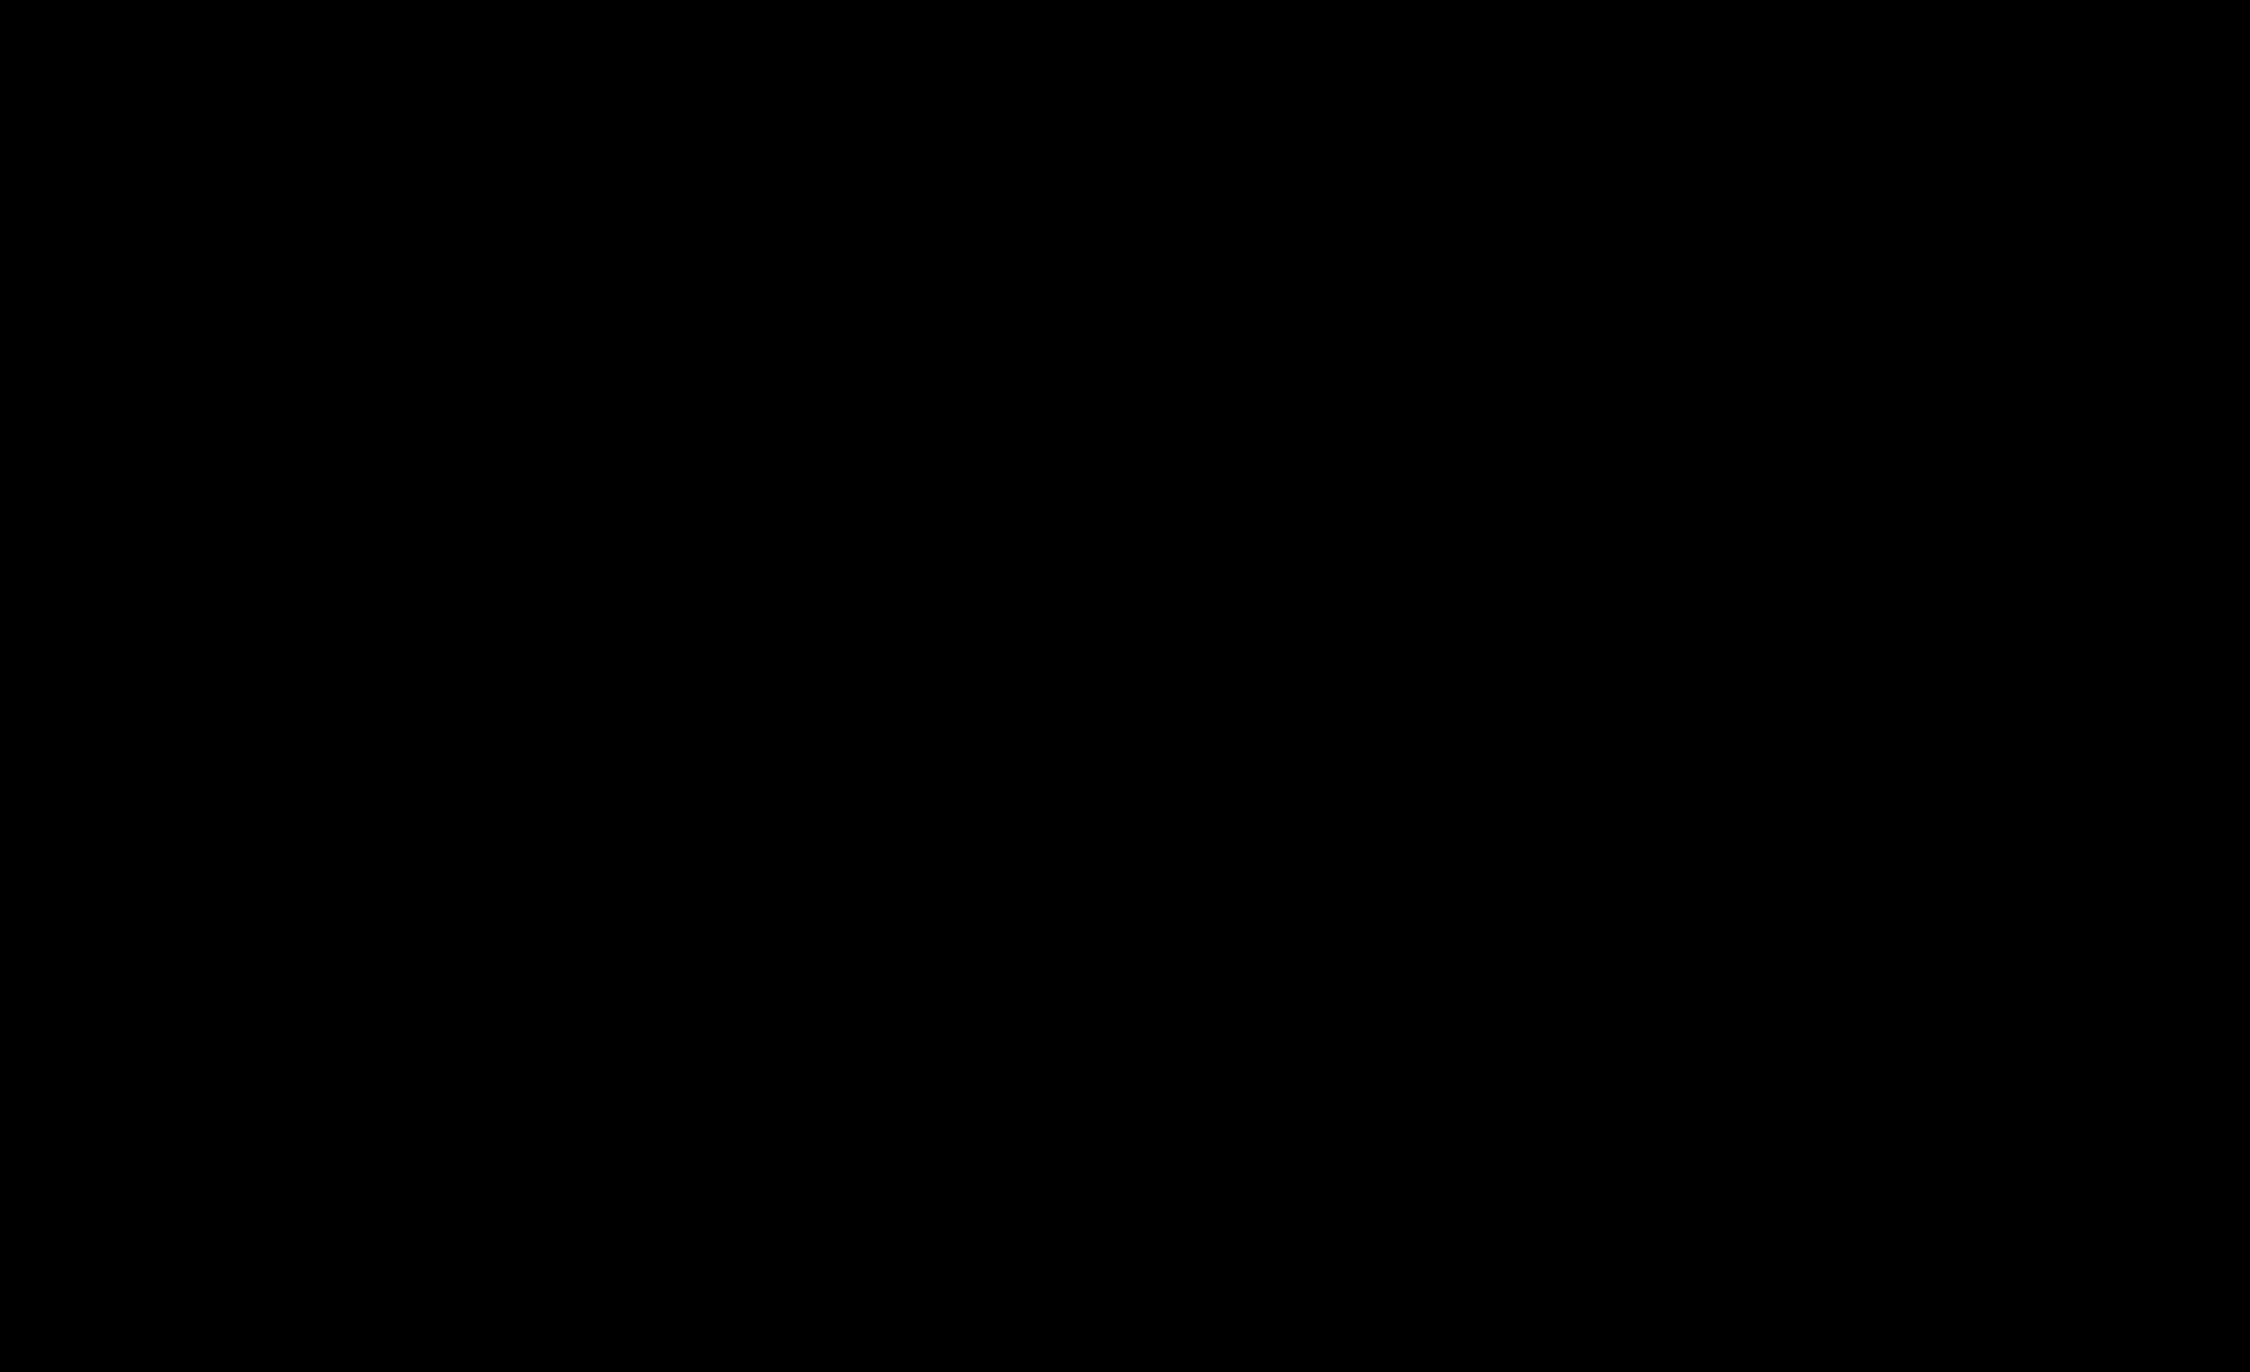 ccapture js - Bountysource